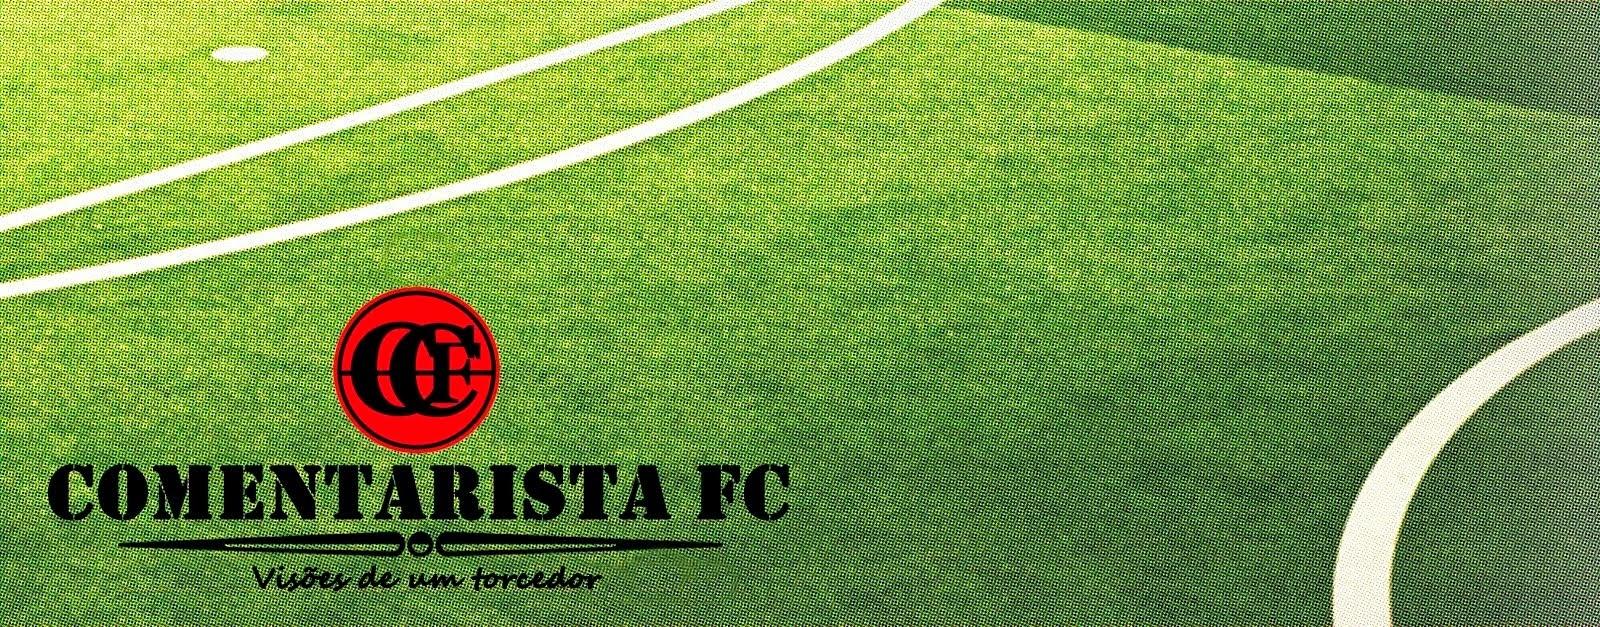 Blog Comentarista FC